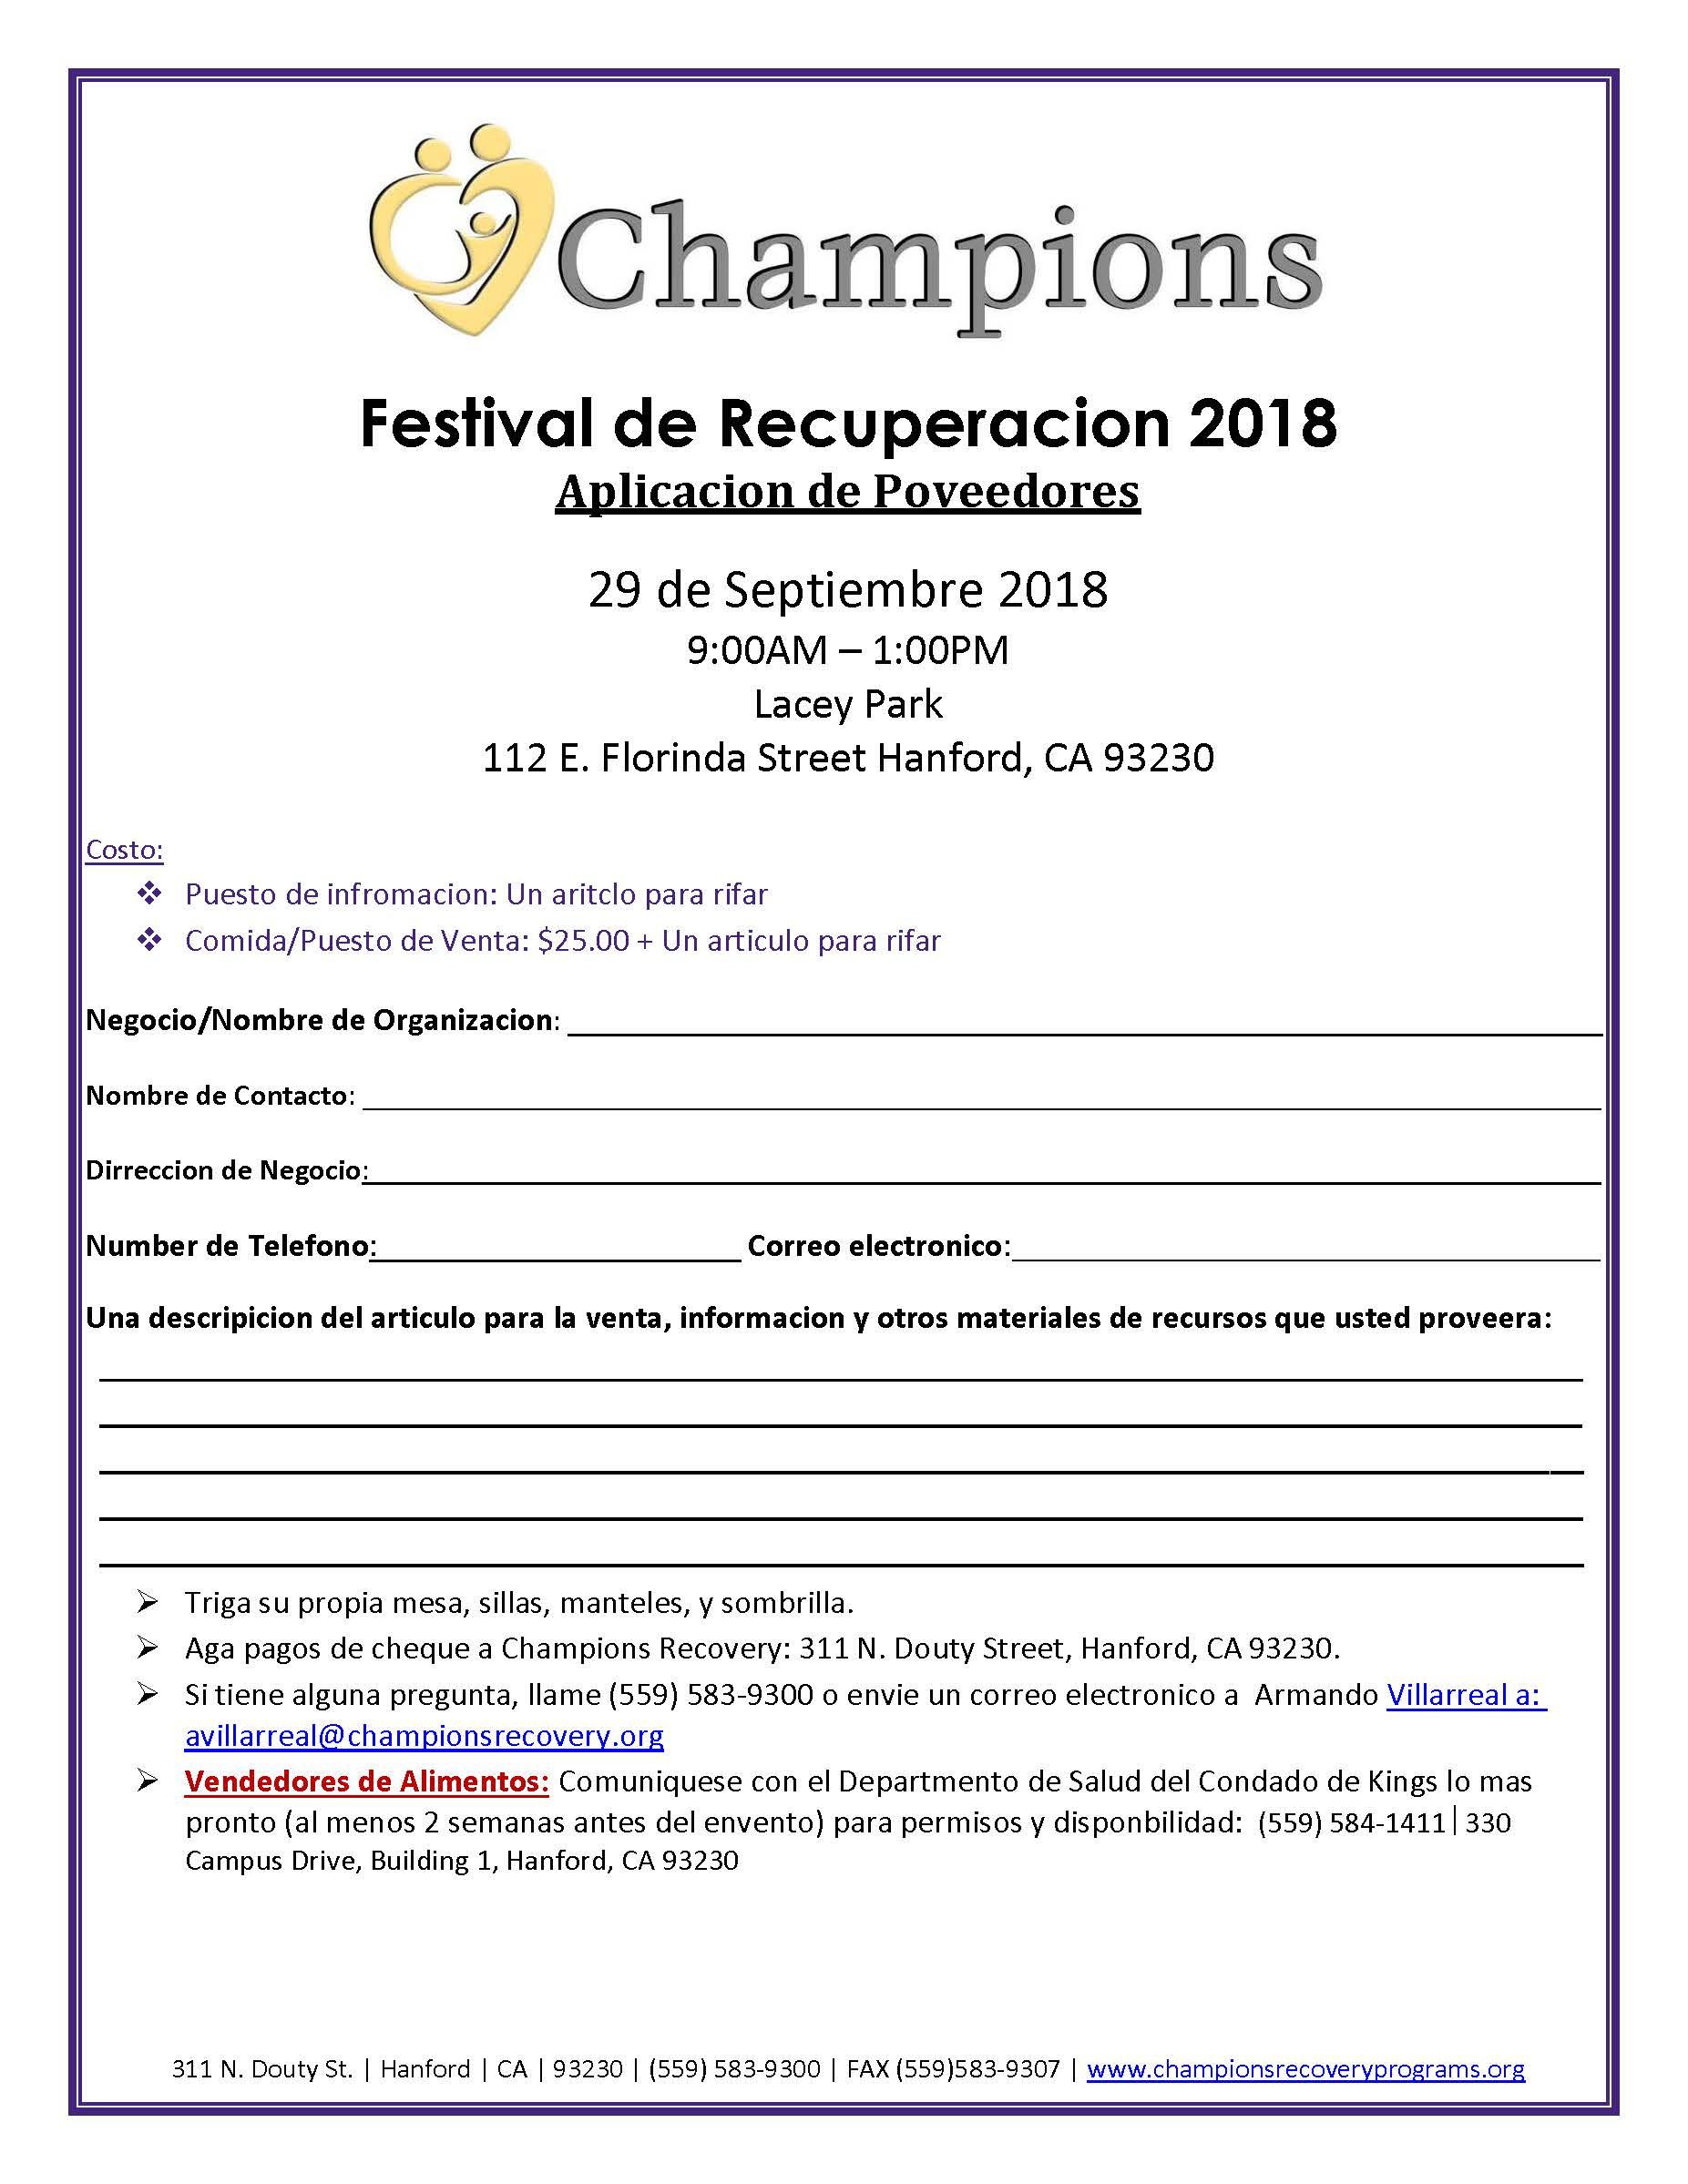 Recovery Fest 2018  Vendor Application_SPanish.jpg